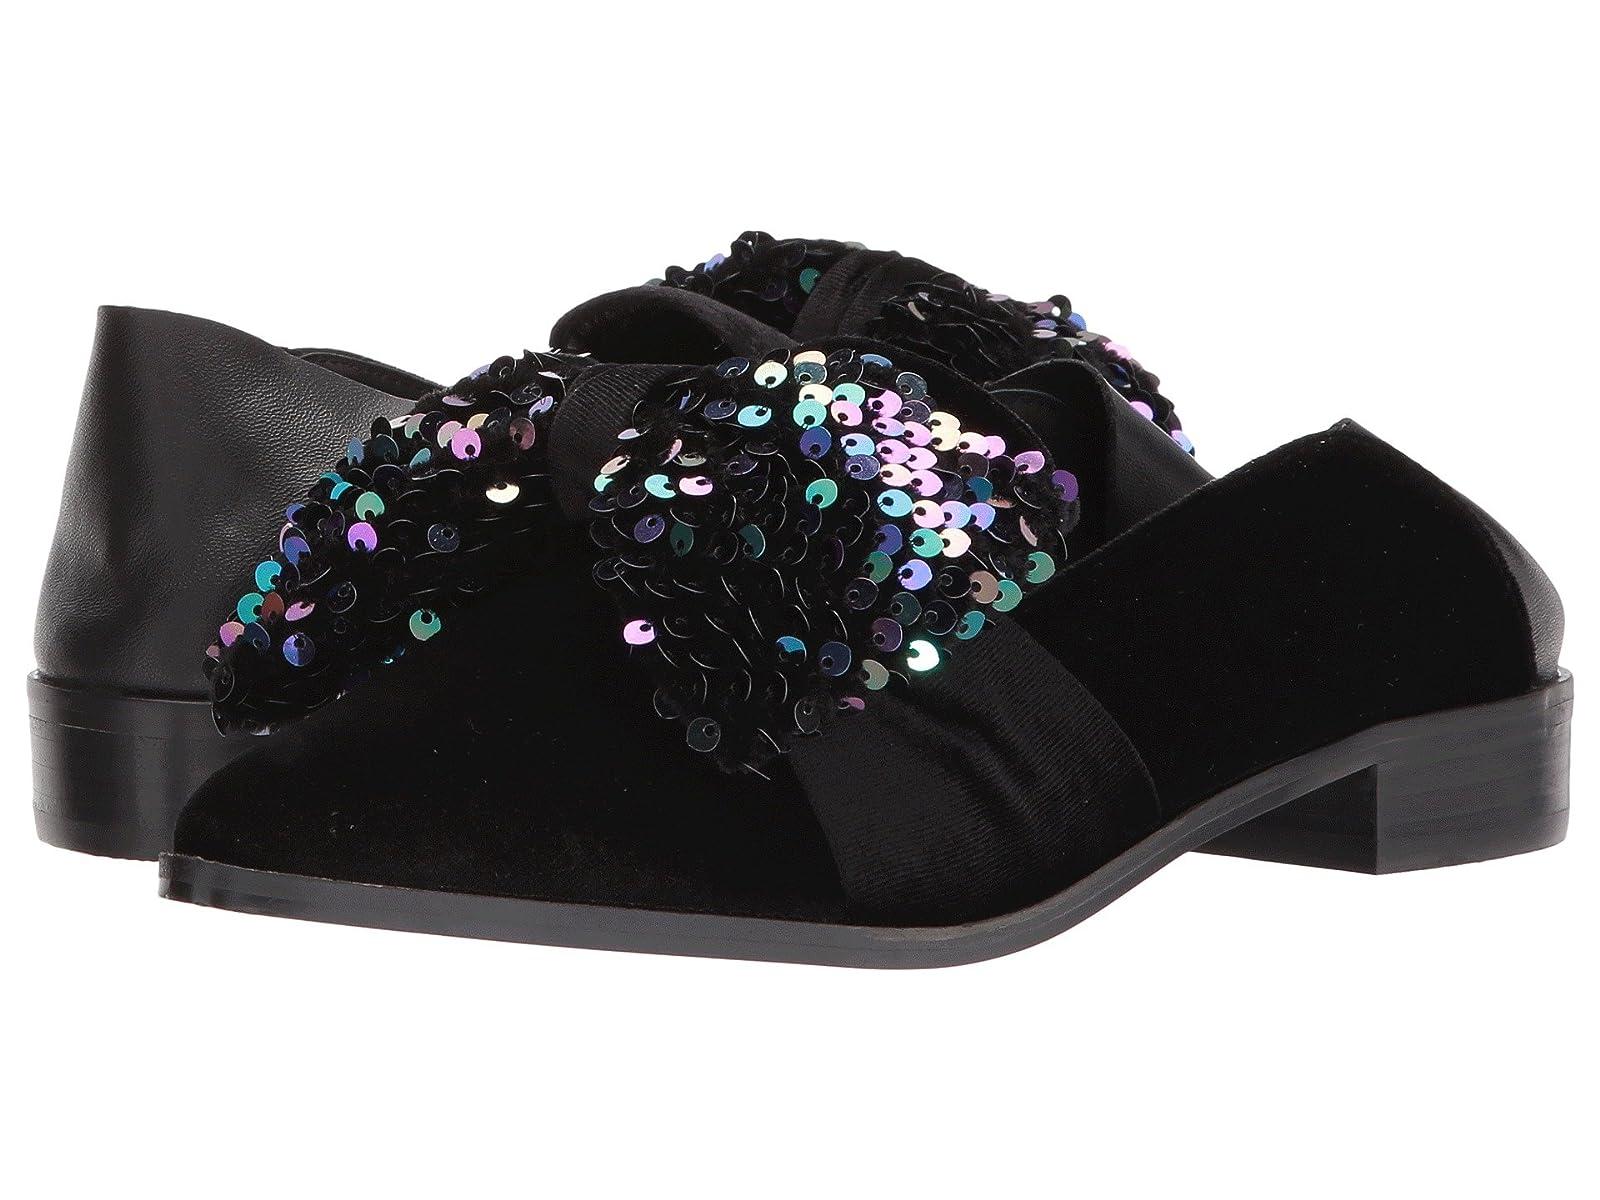 Shellys London FayeCheap and distinctive eye-catching shoes